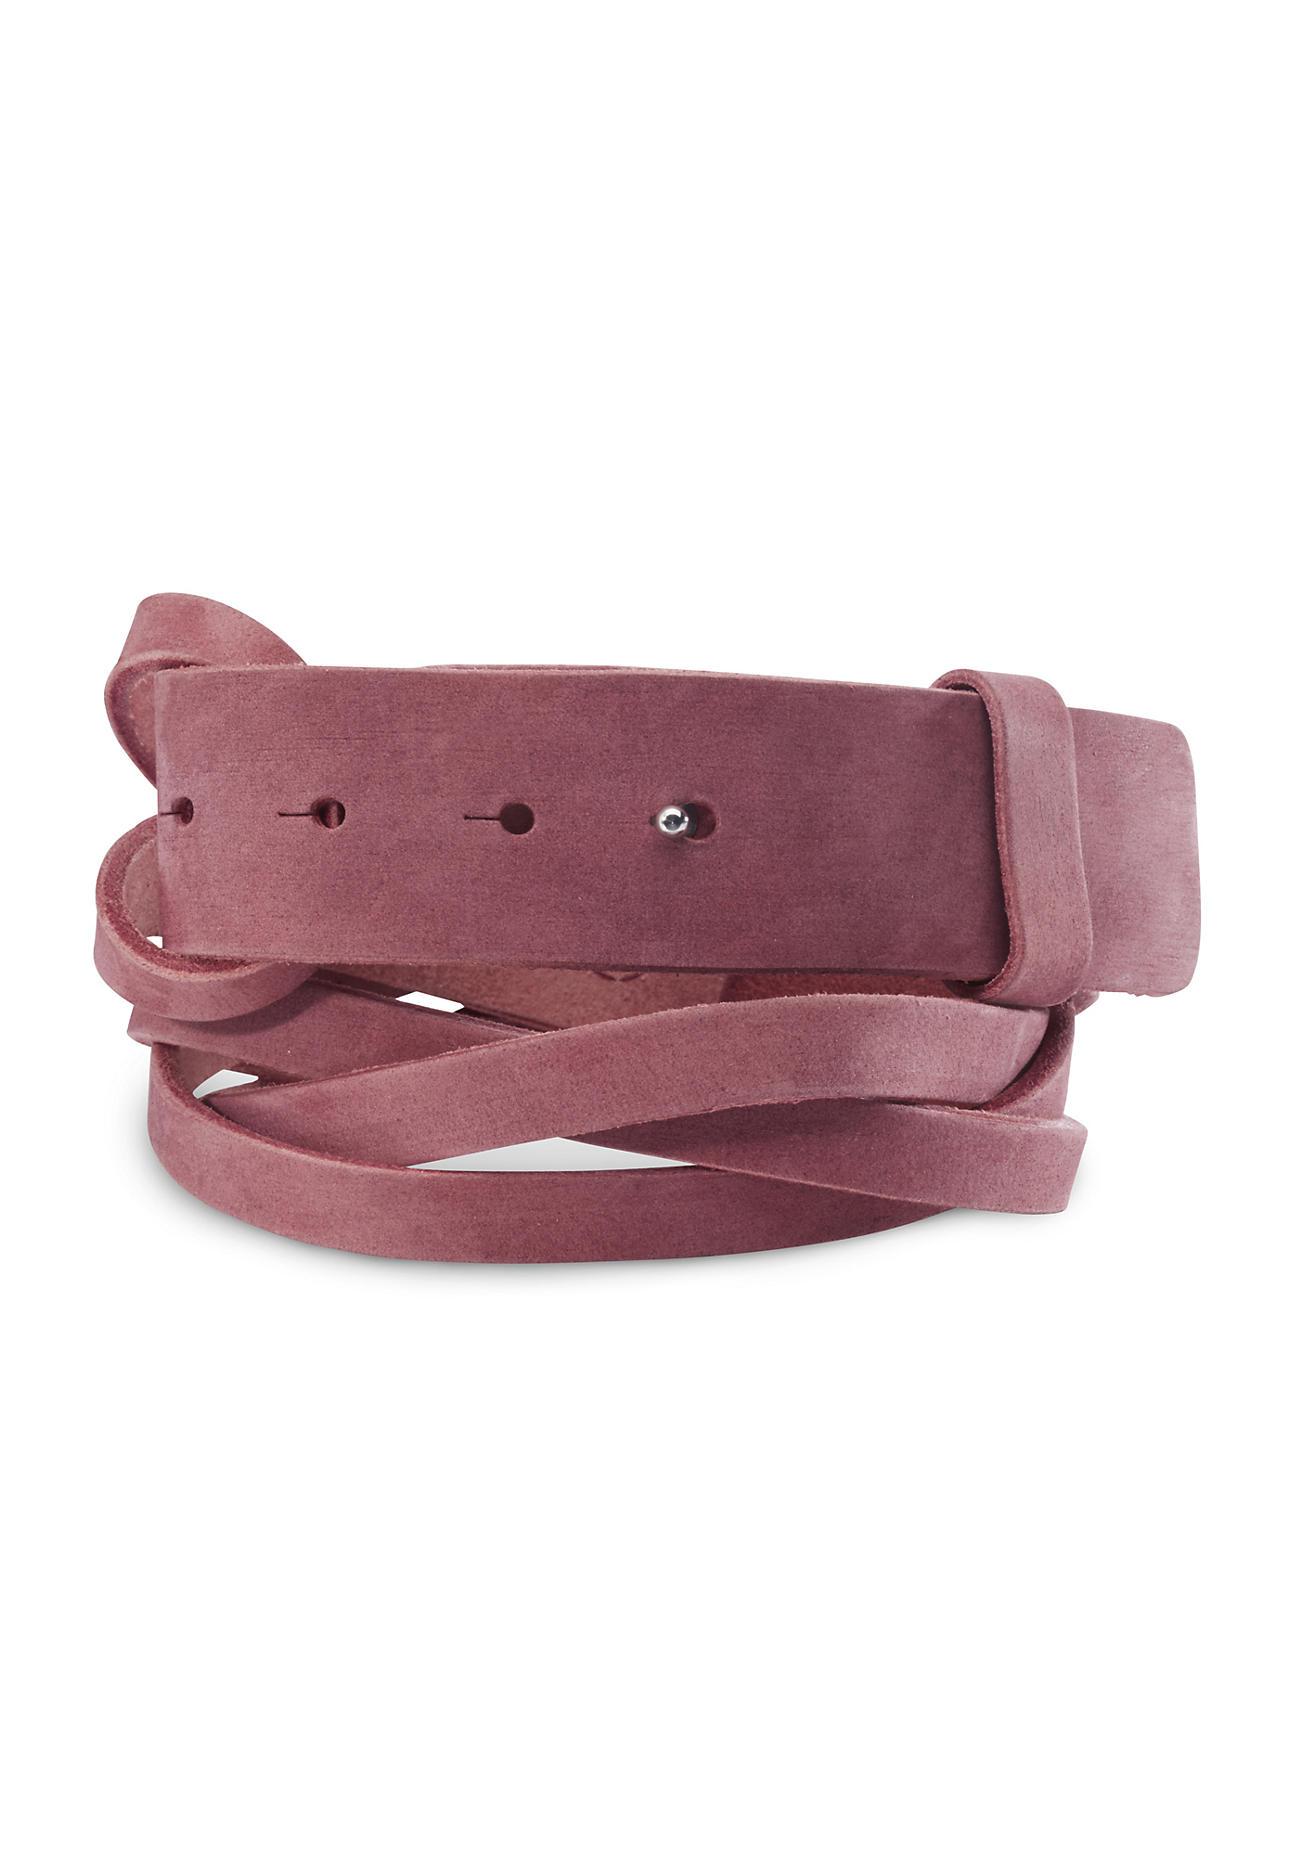 Guertel für Frauen - hessnatur Damen Damen Gürtel aus Leder – rosa –  - Onlineshop Hessnatur